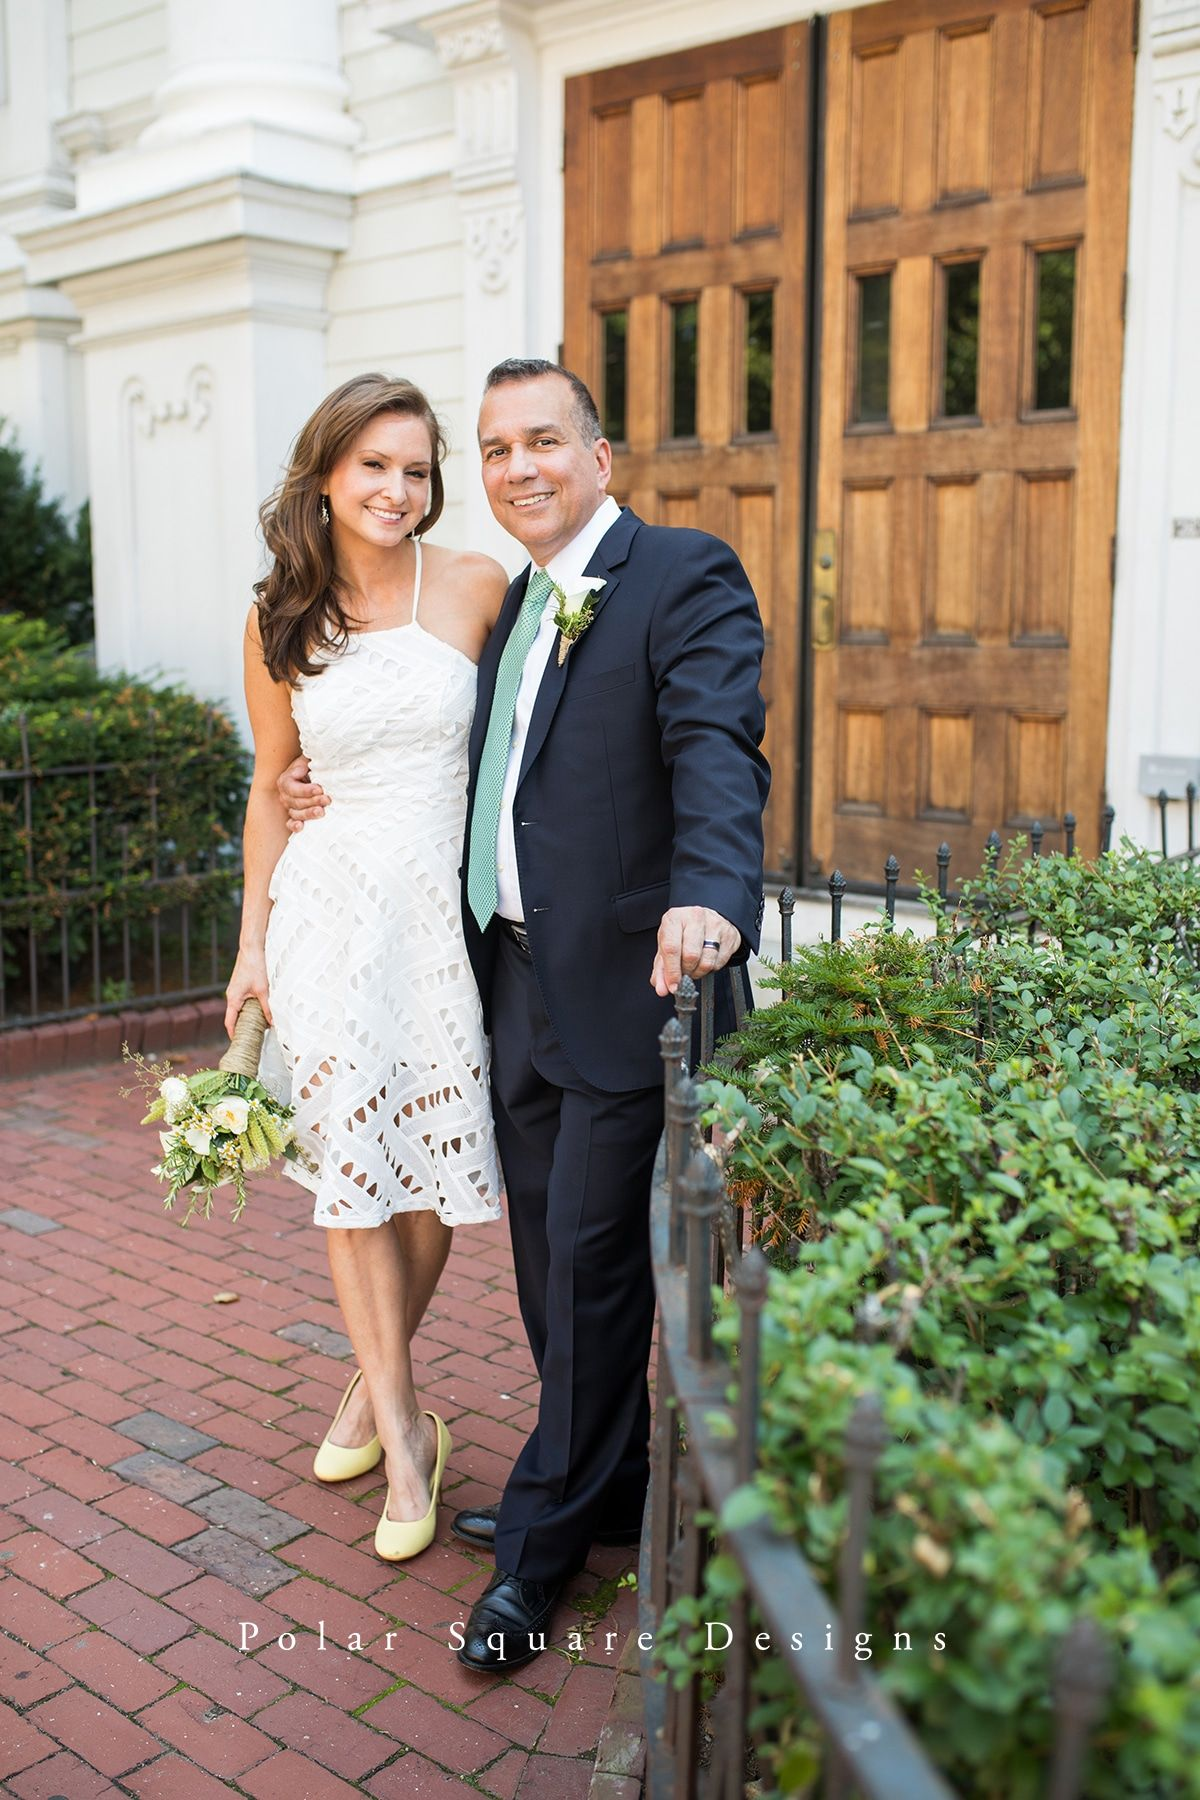 Christine And Joe City Hall Wedding Elope Wedding Wedding